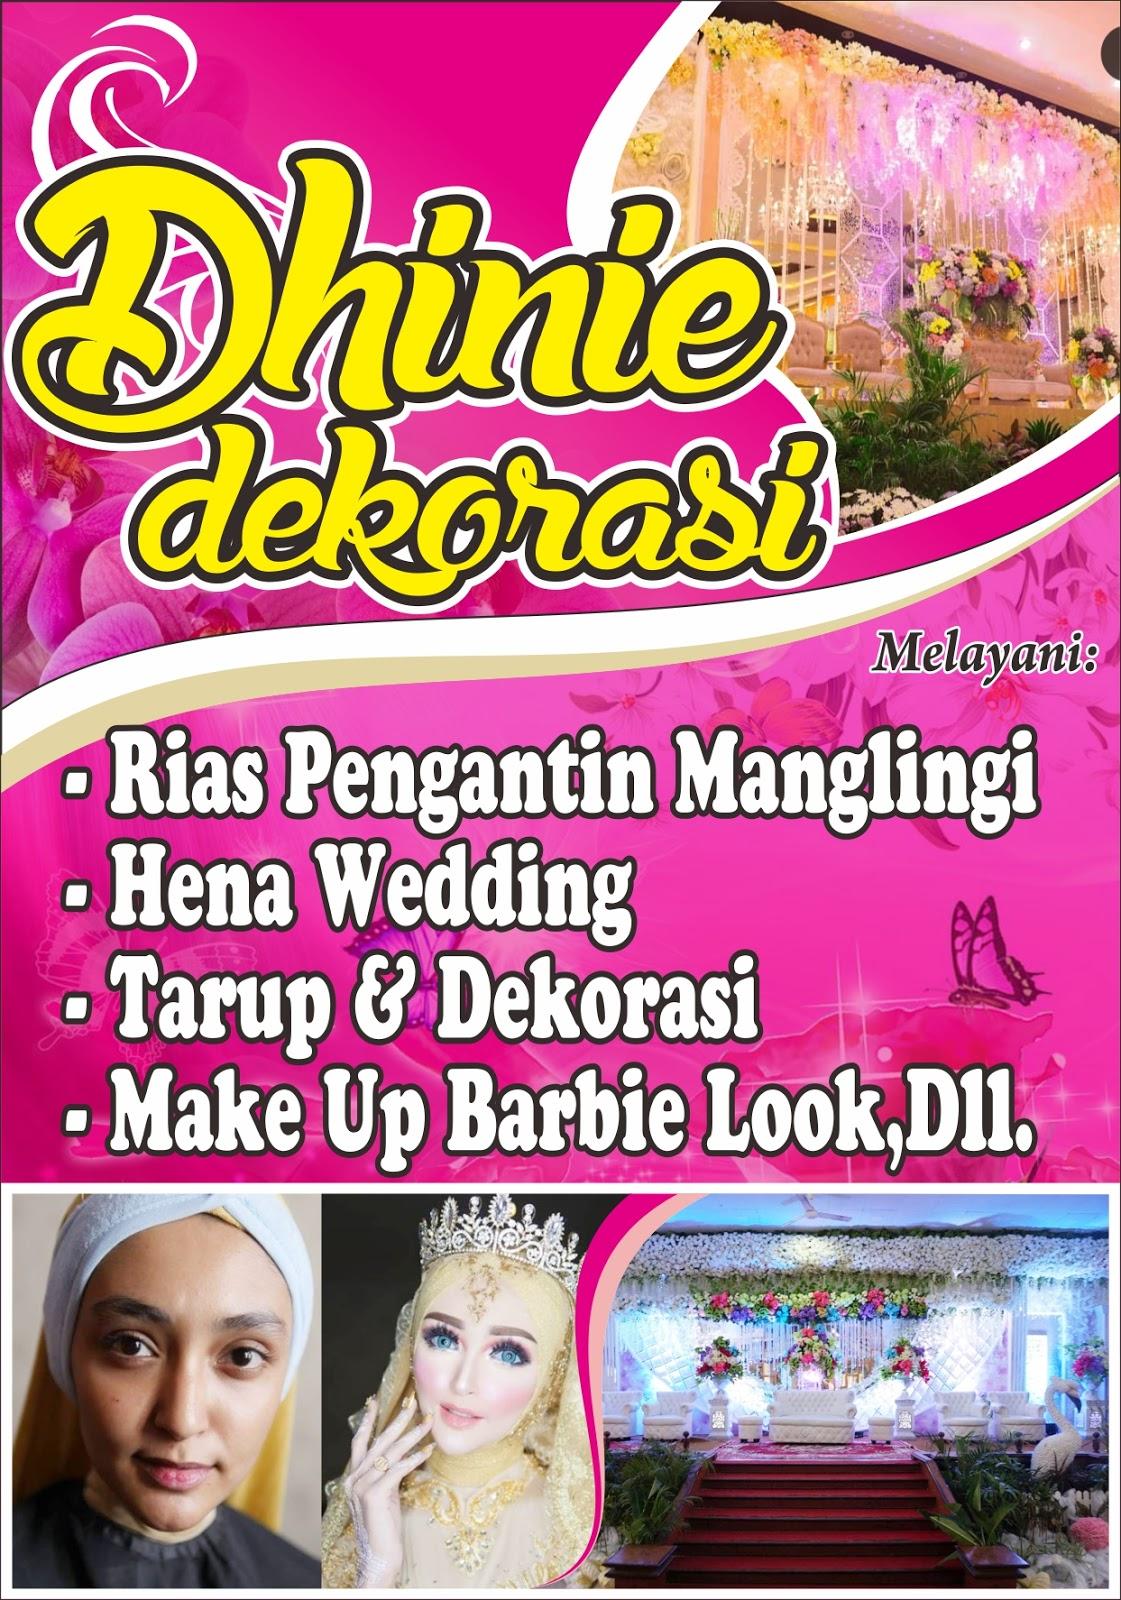 Free Download Design Banner Salon cdr - Design_Spanduk